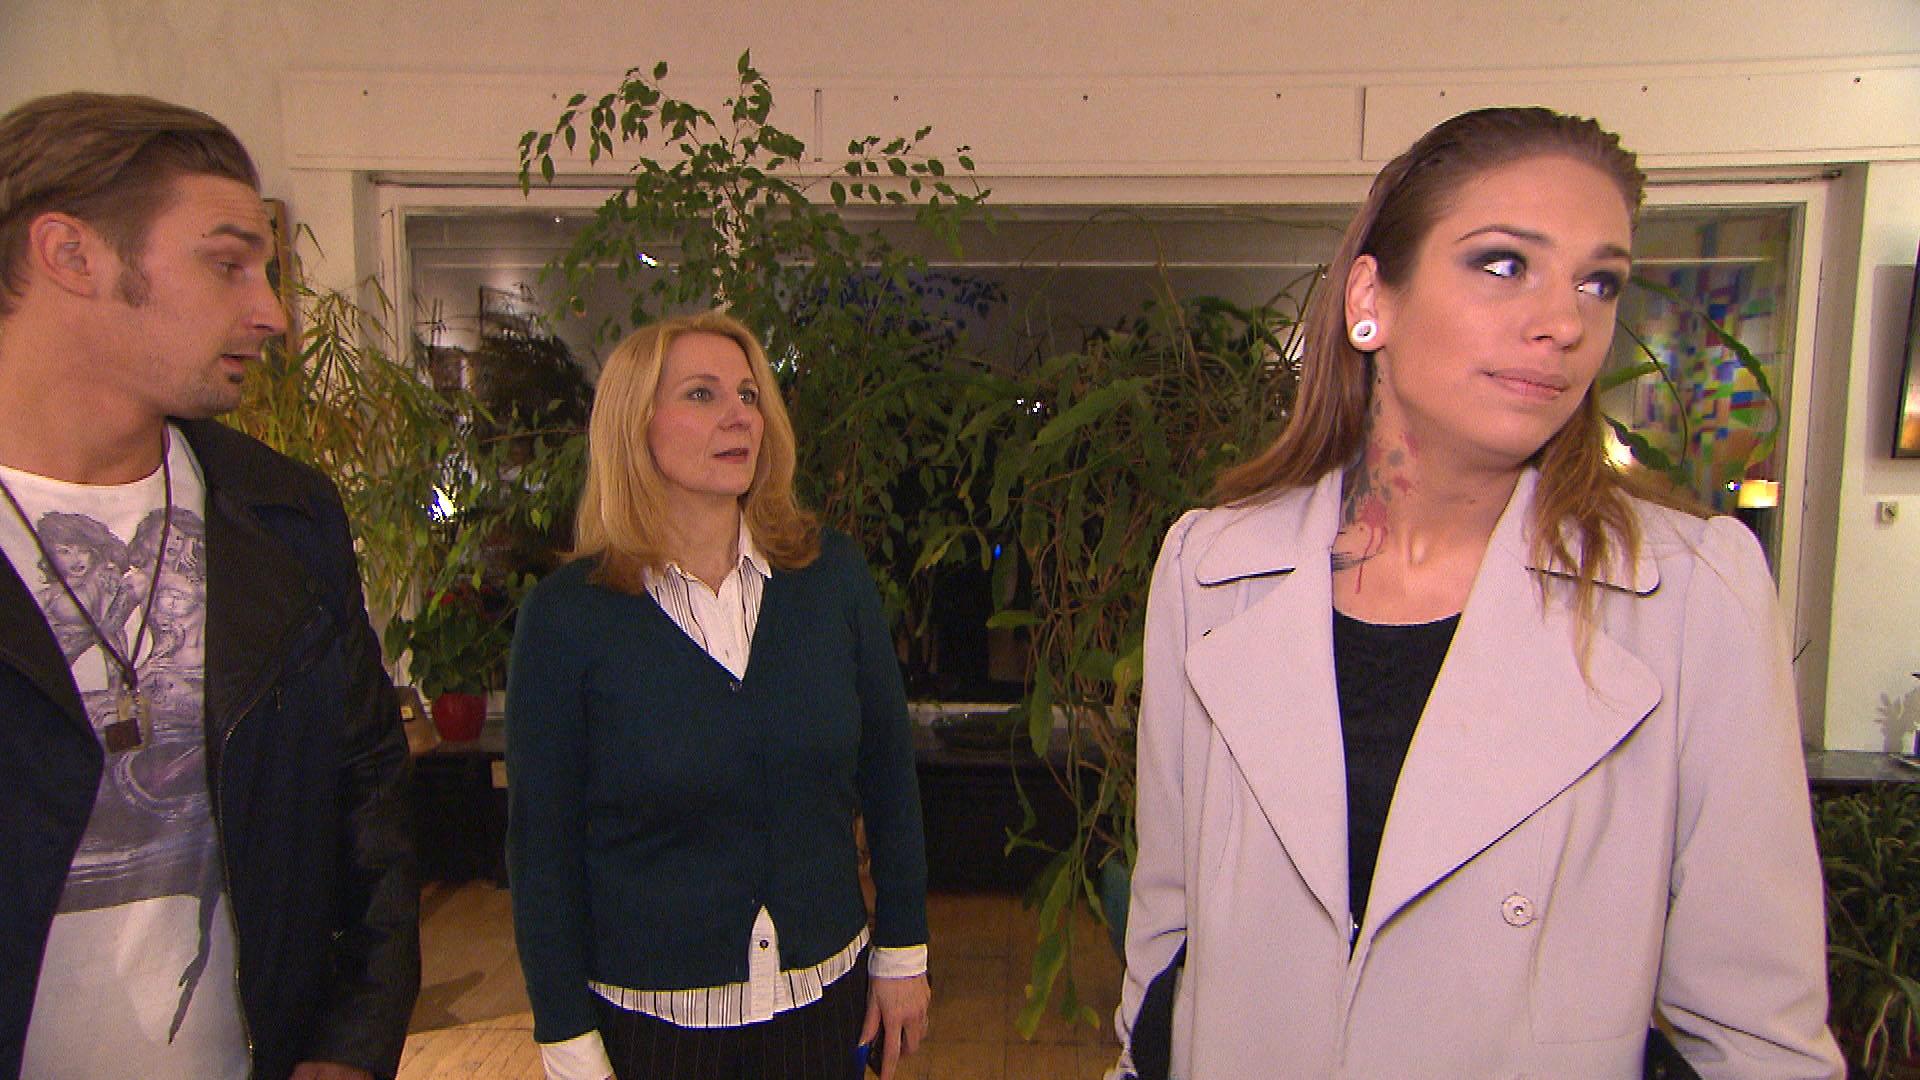 Leon,li. Millas Mutter,Mi. Milla,re. (Quelle: RTL 2)